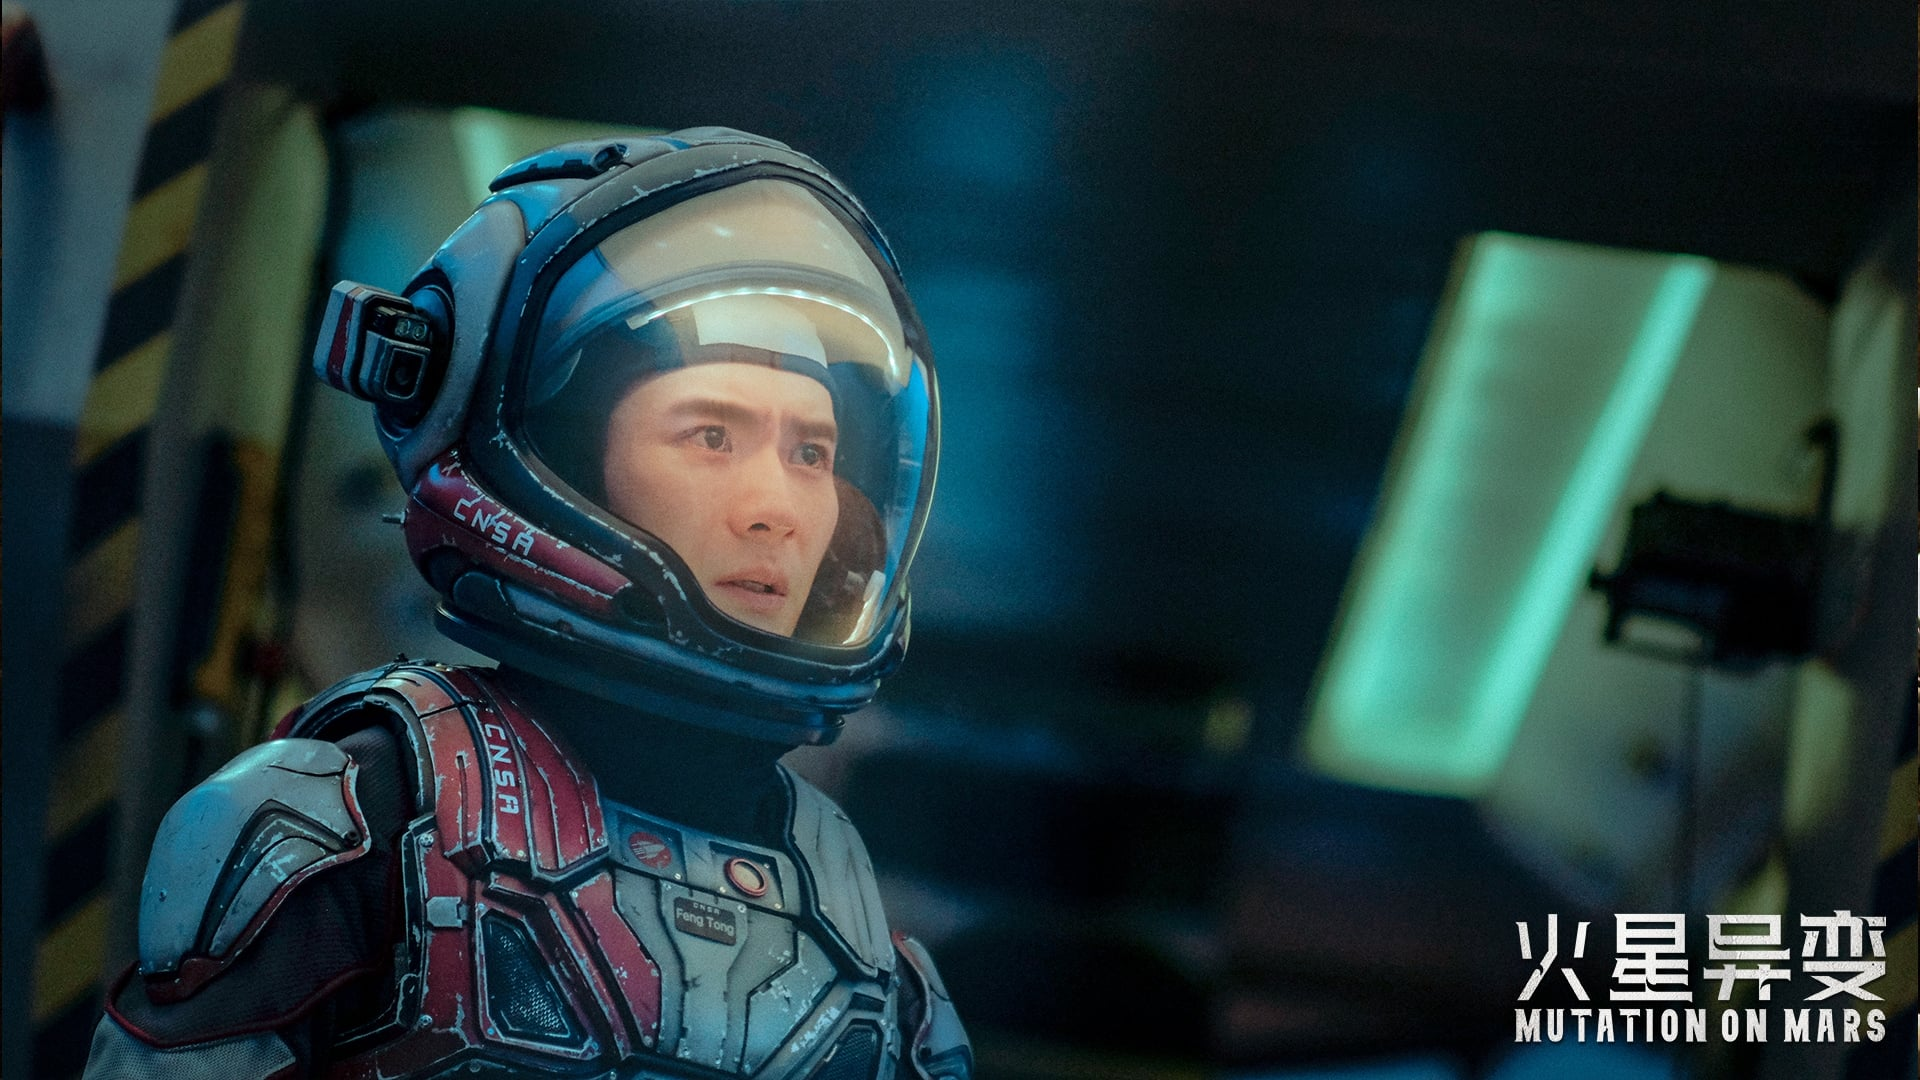 Mutation on Mars (2021) English Full Movie Watch Online